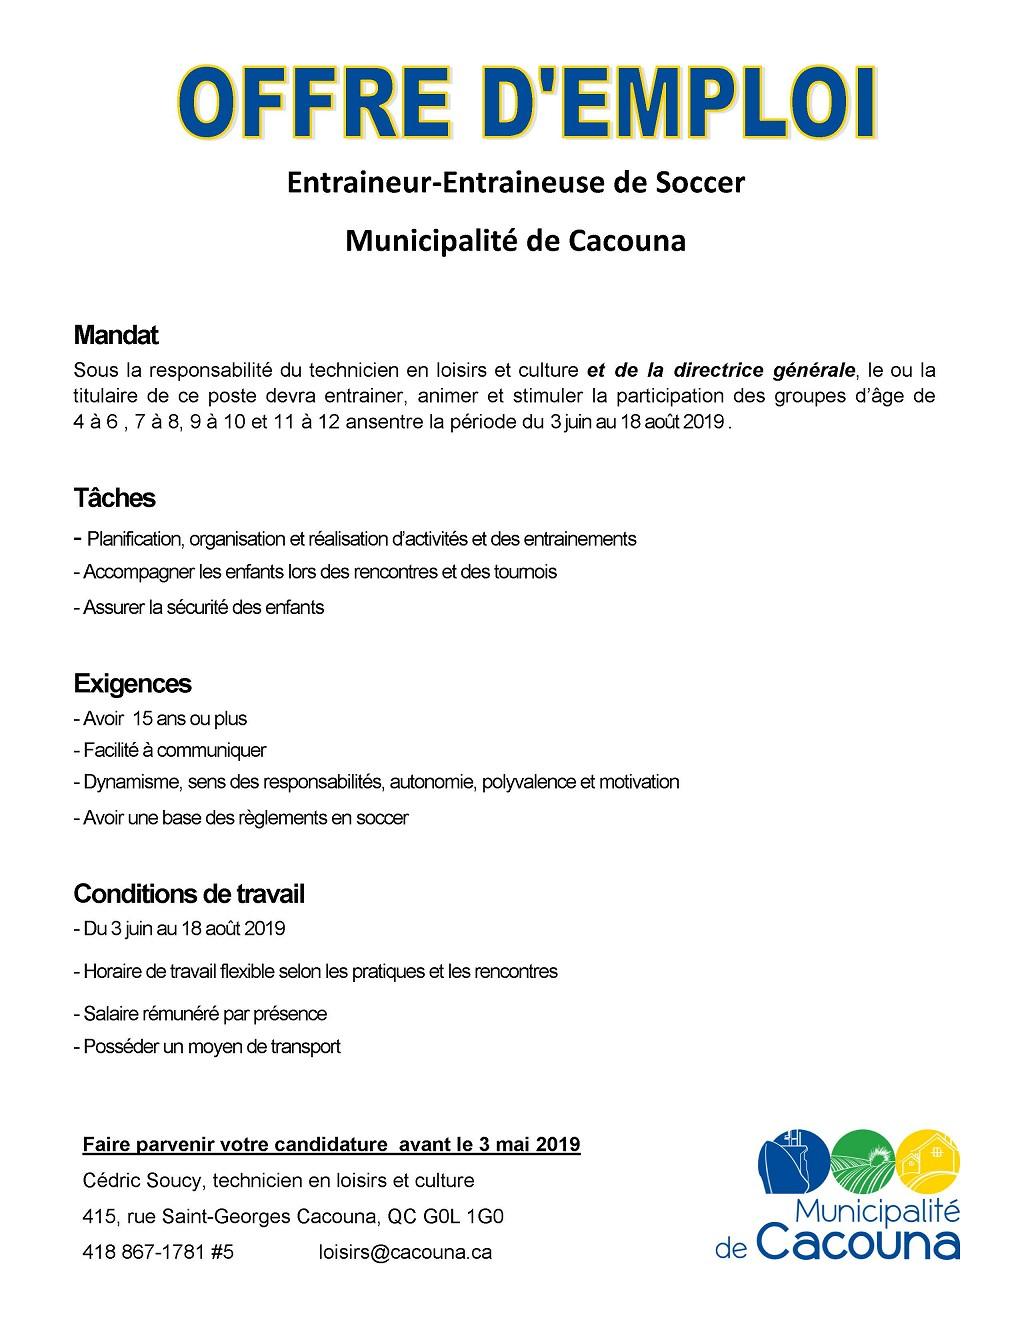 Offre d'emploi Soccer 2019 (Photo : © Angélika)